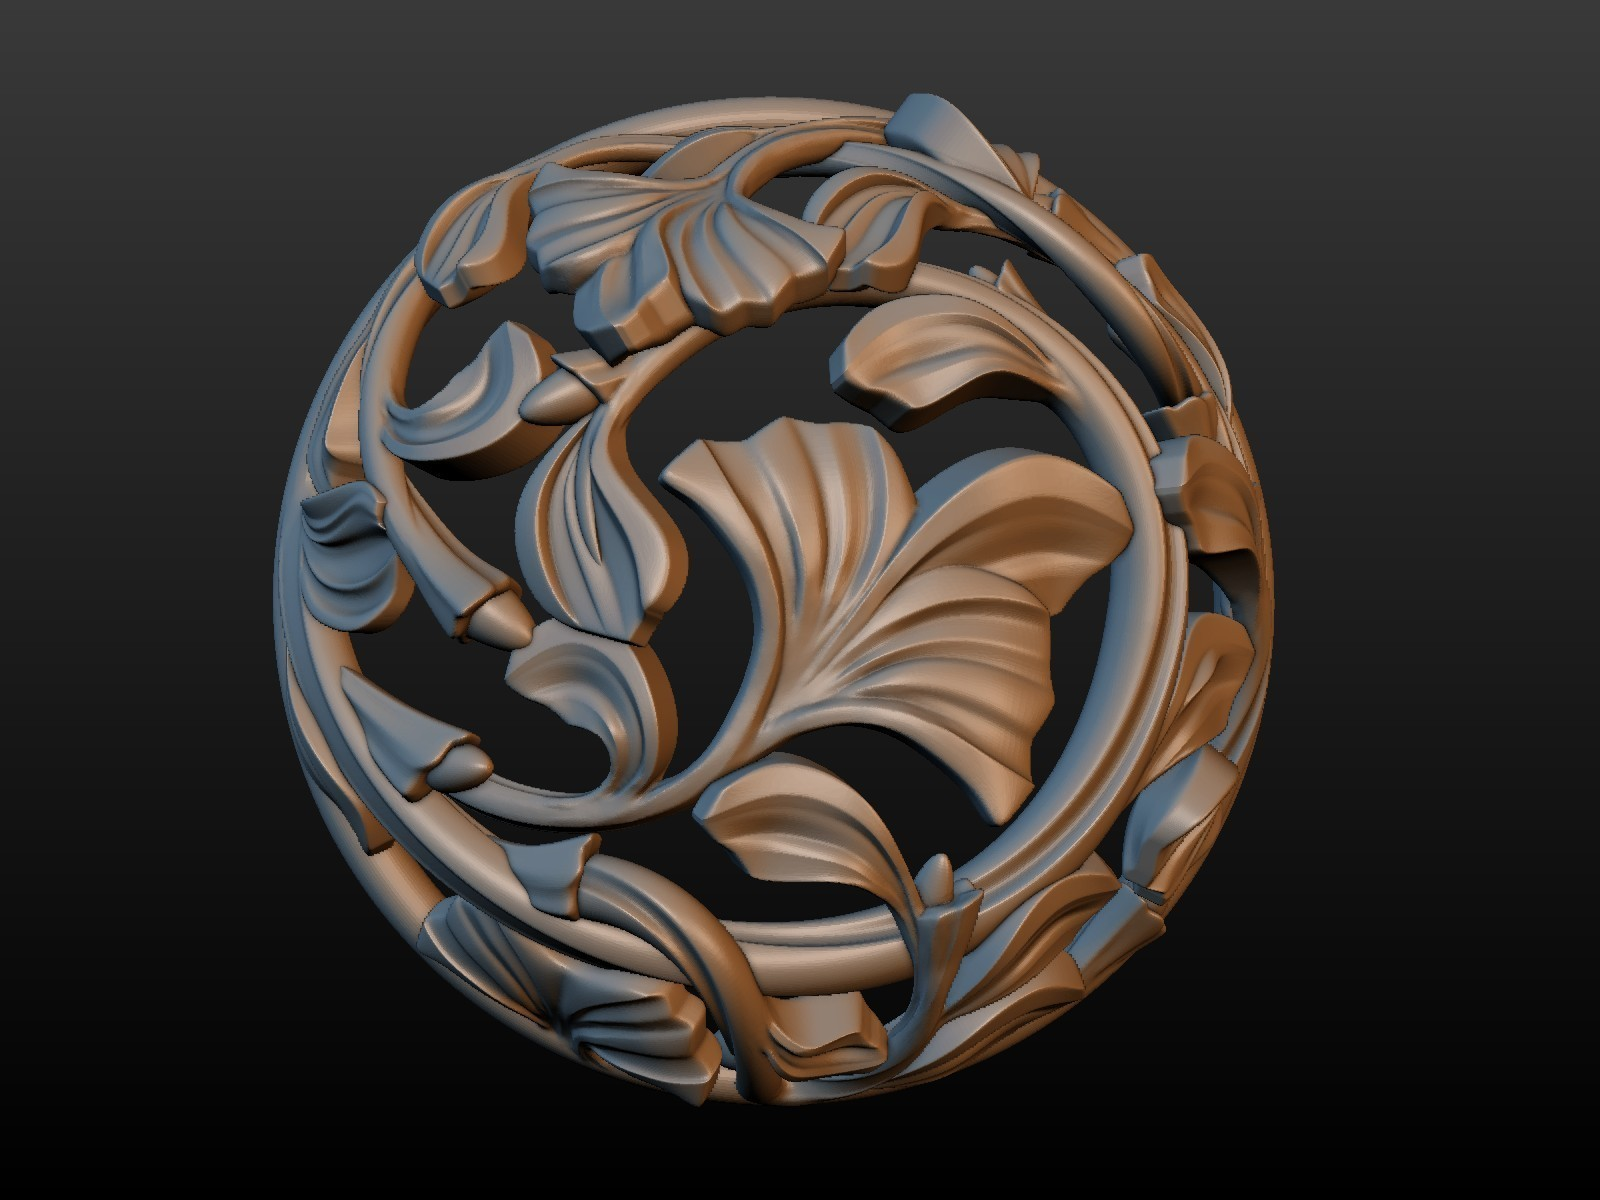 Earring-14.jpg Download STL file Earring • 3D printing template, Skazok